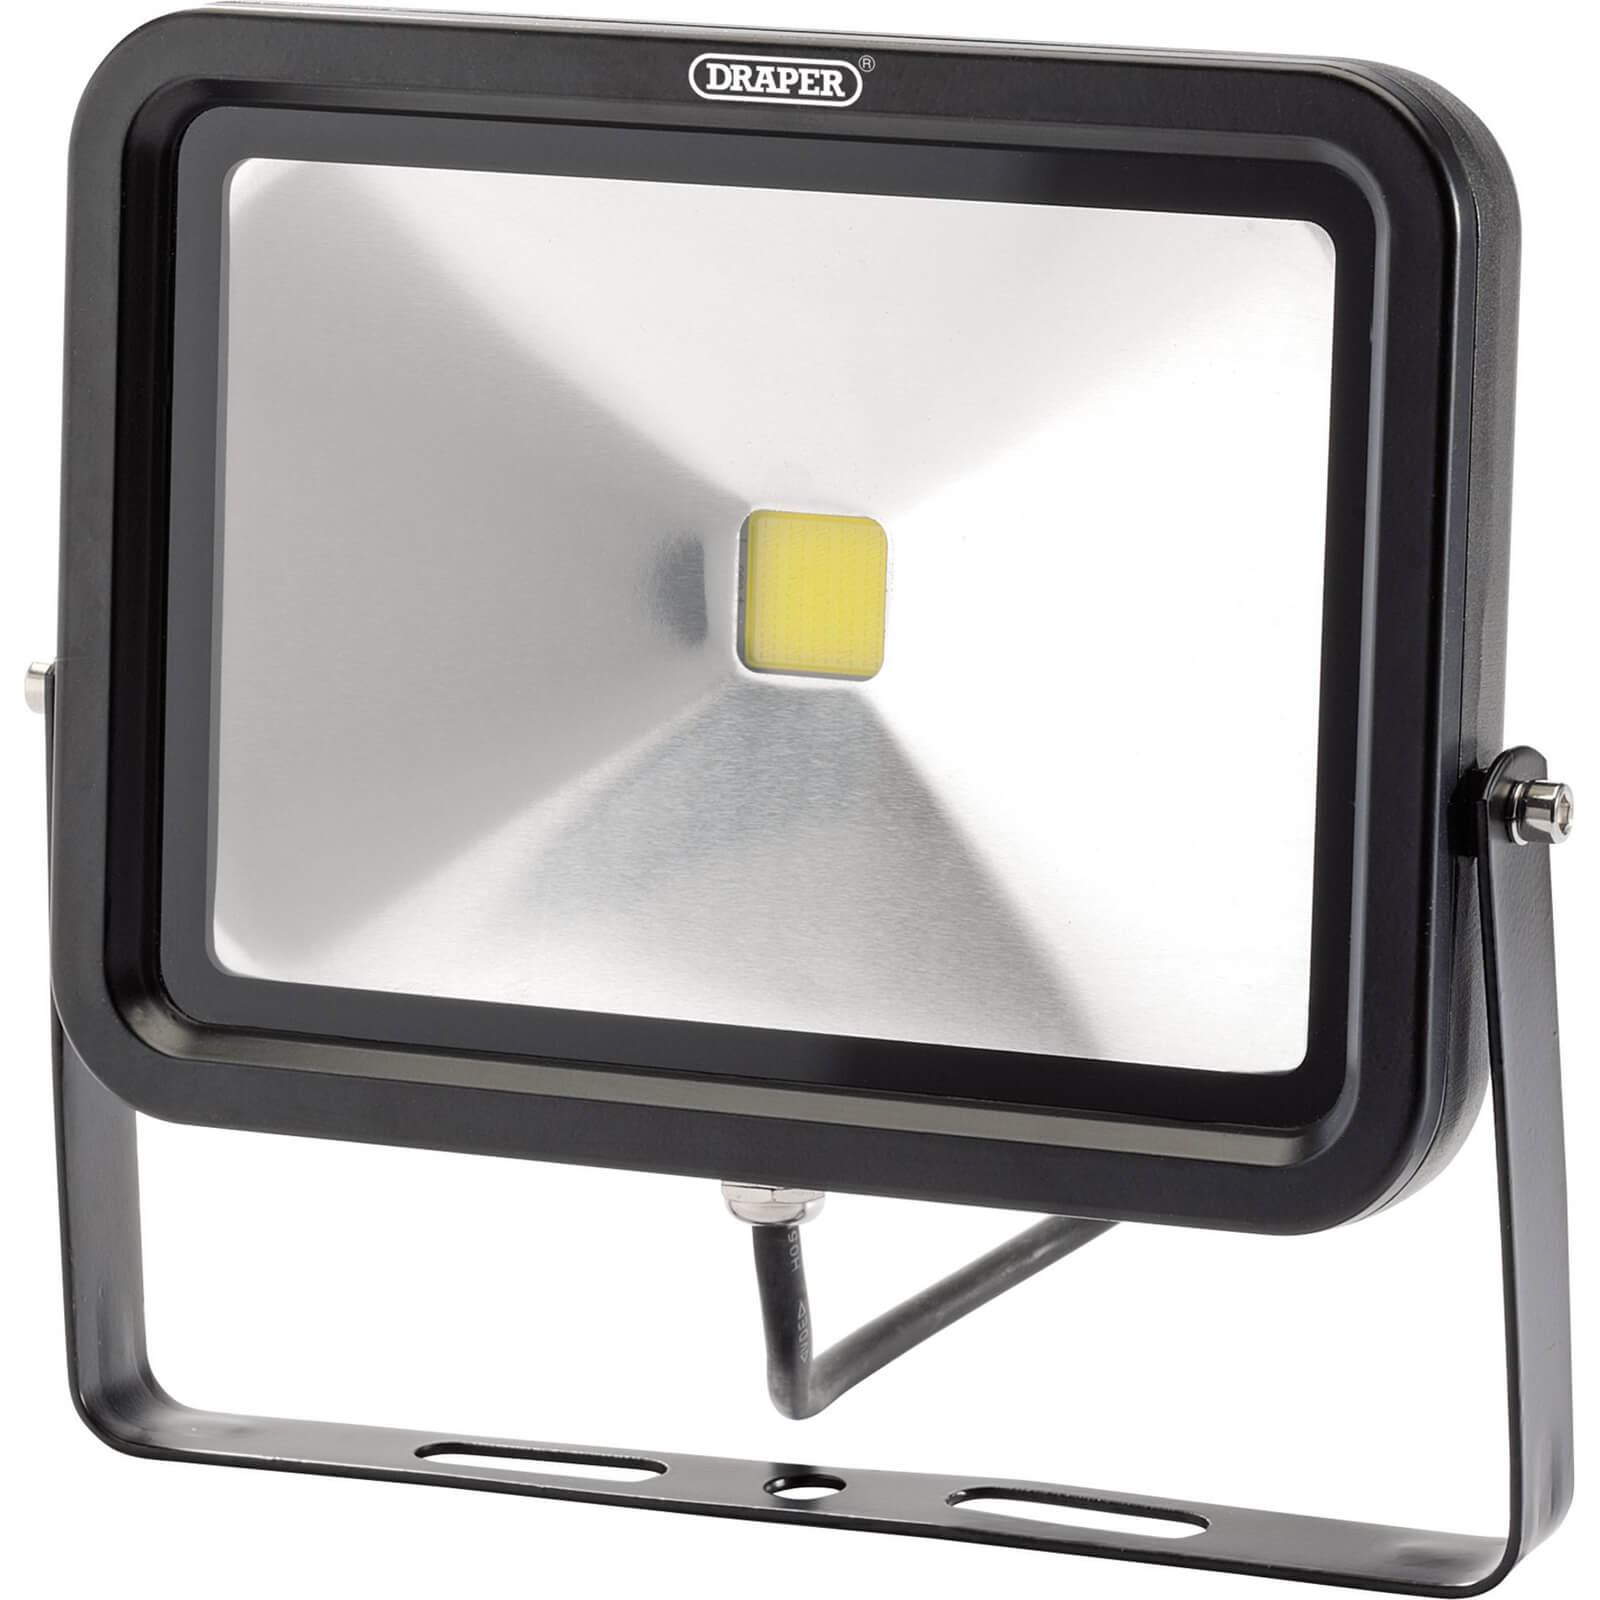 Image of Draper COB LED Slimeline Wall Mounted Floodlight 30 Watts